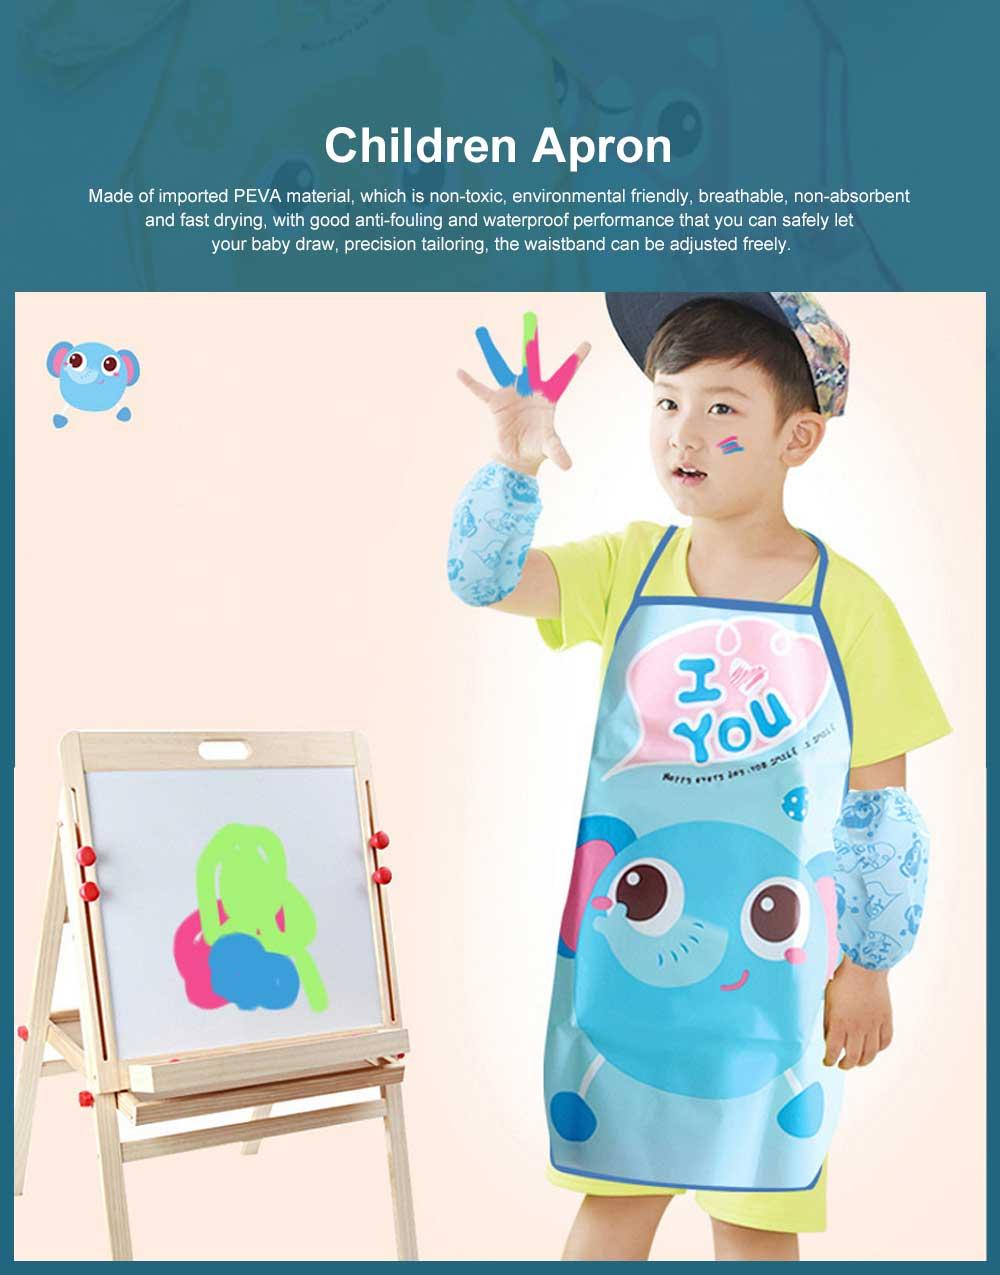 Children Cartoon Apron, PEVA Creative Lovely Pattern Cute Apron, Waterproof Painting Anti-fouling Sleeveless Bust Apron 0